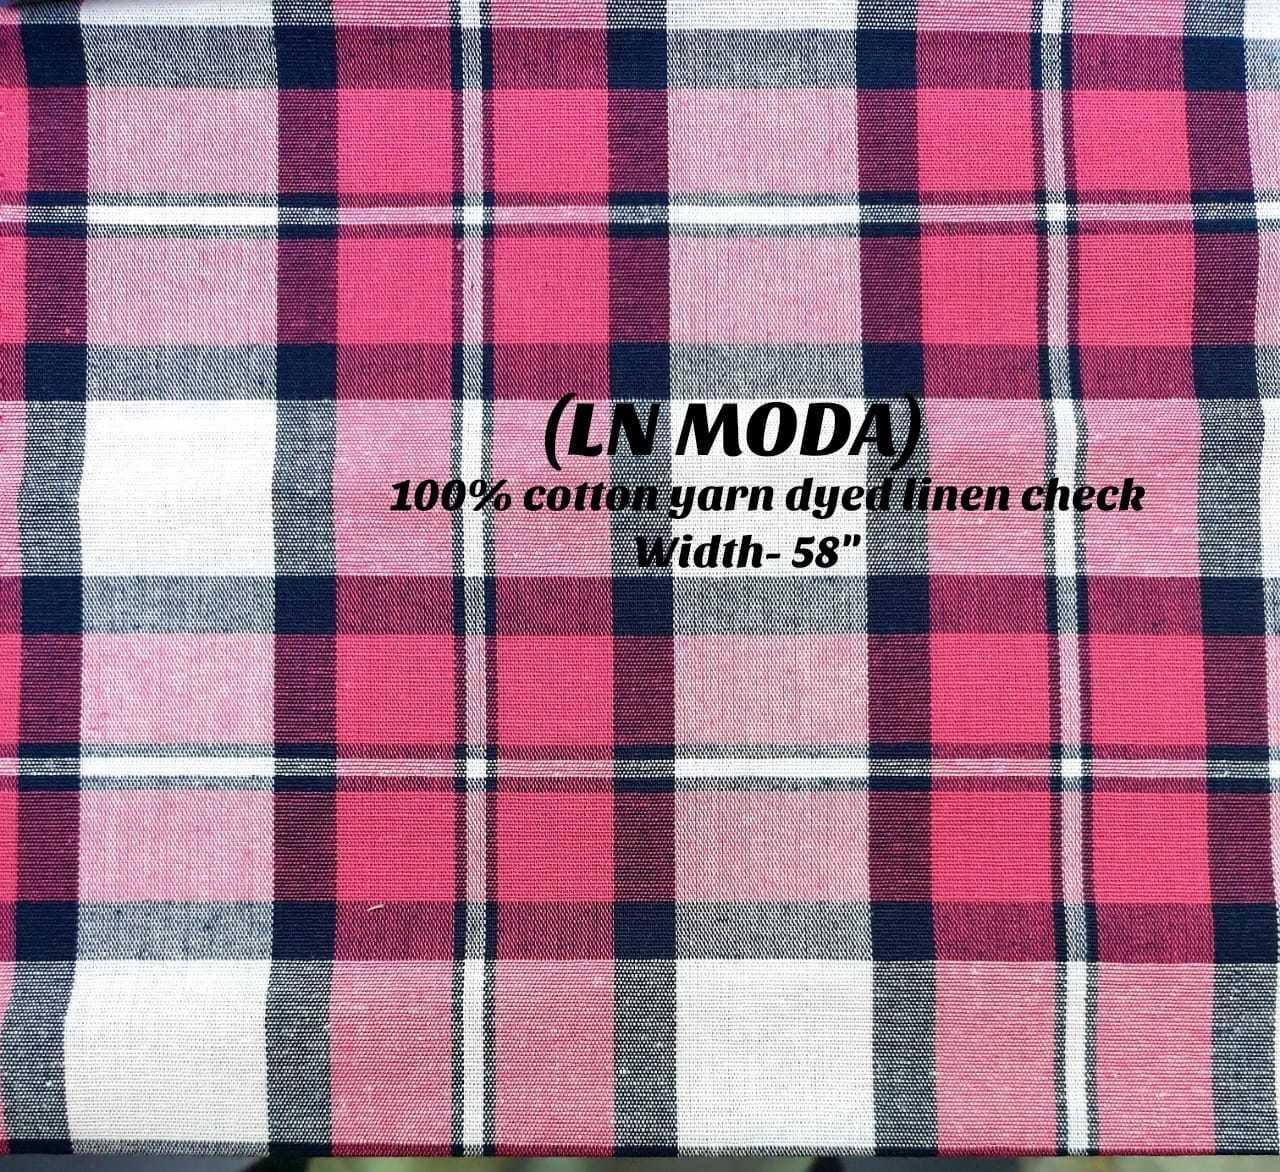 LN MODA 100% cotton yarn dyed linen check